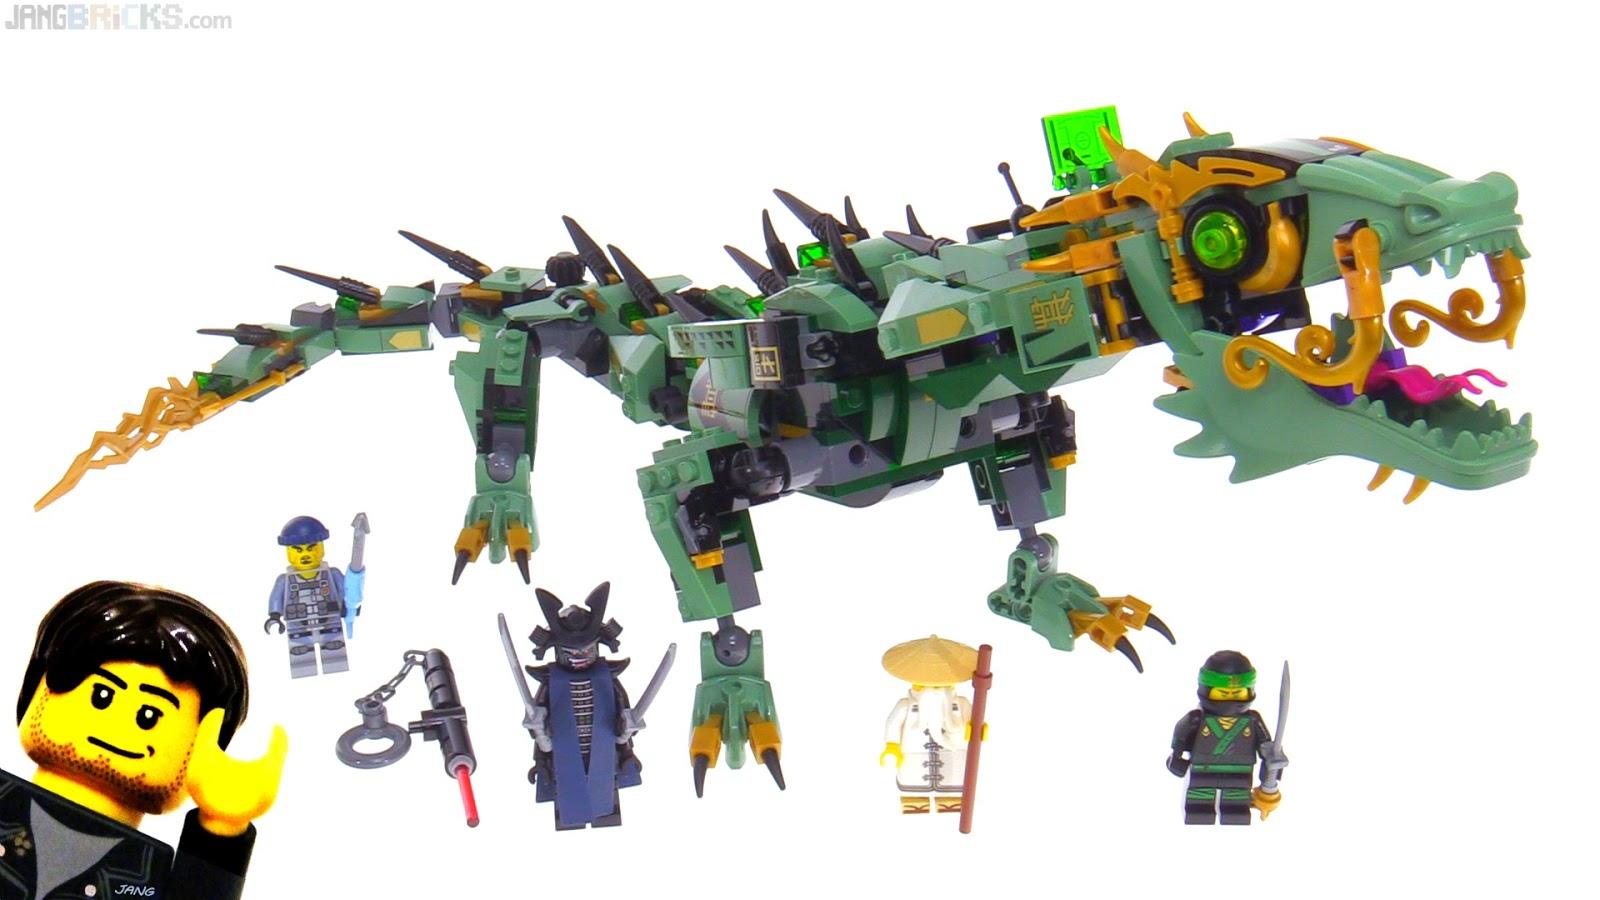 LEGO Ninjago Movie set reviews so far